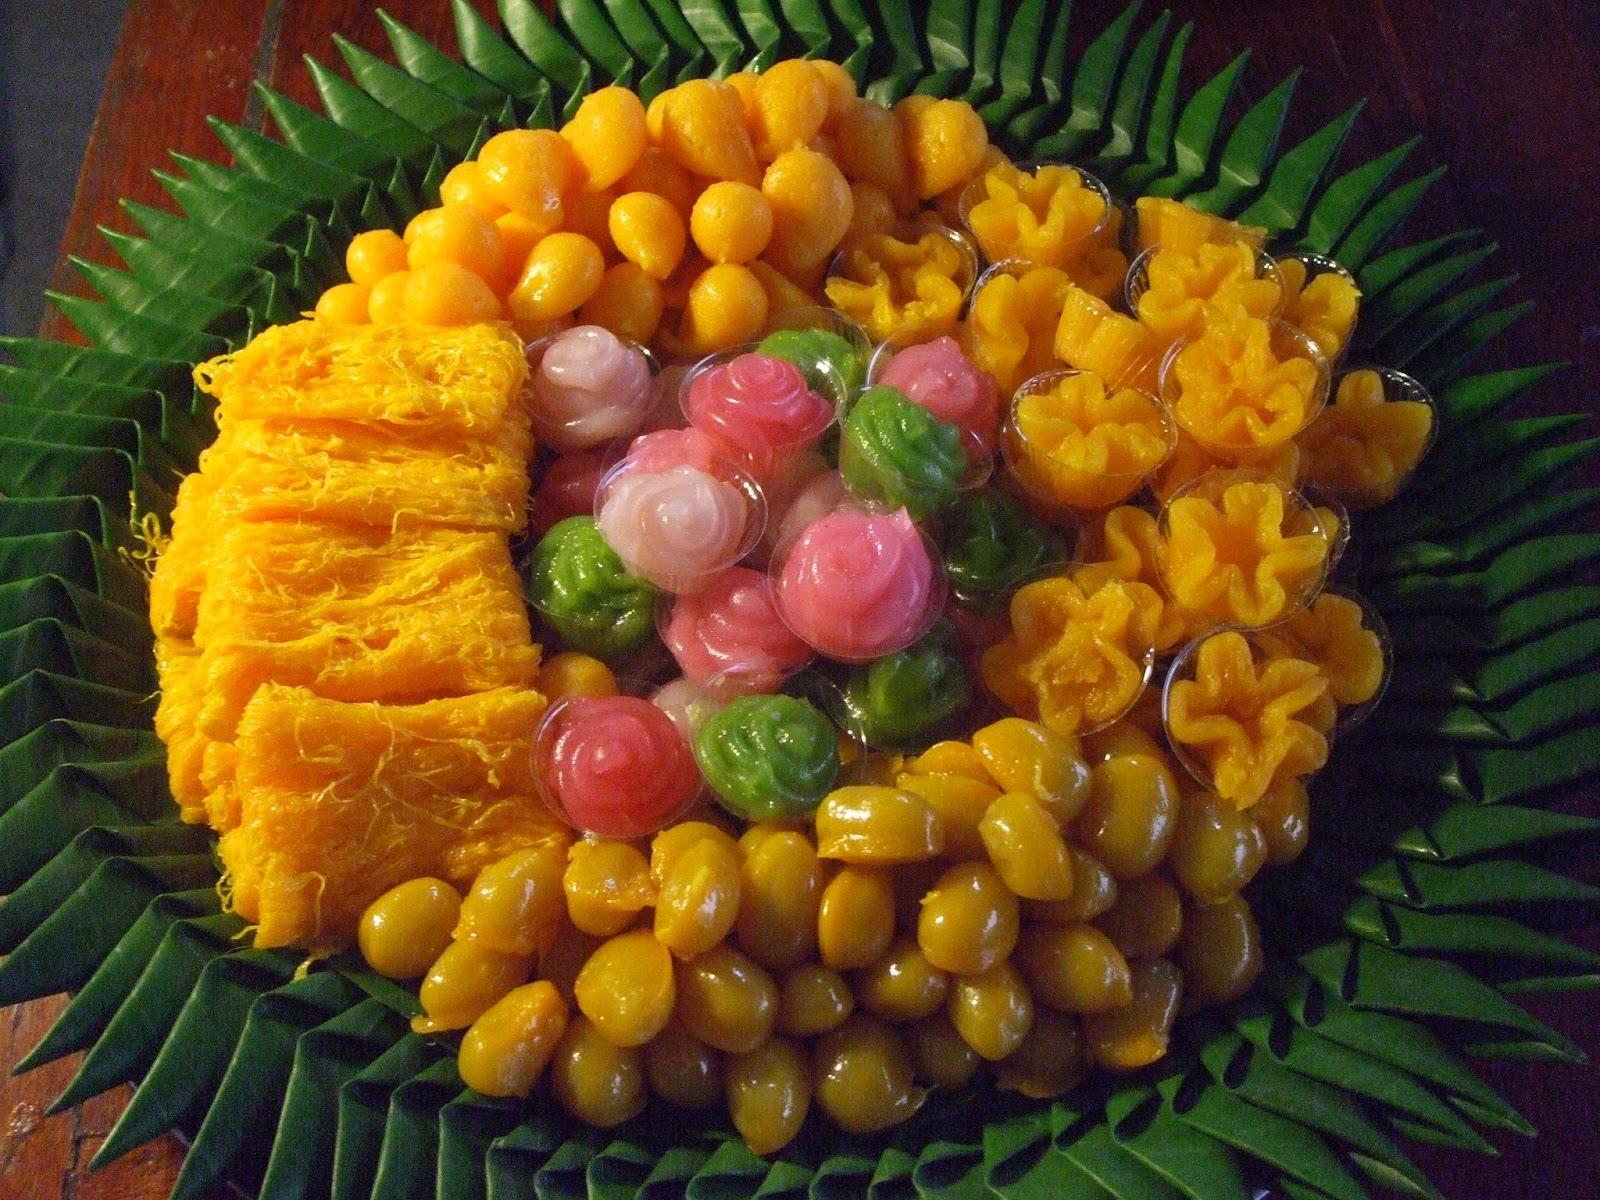 Tong S Thai Restaurant South Murwillumbah Nsw